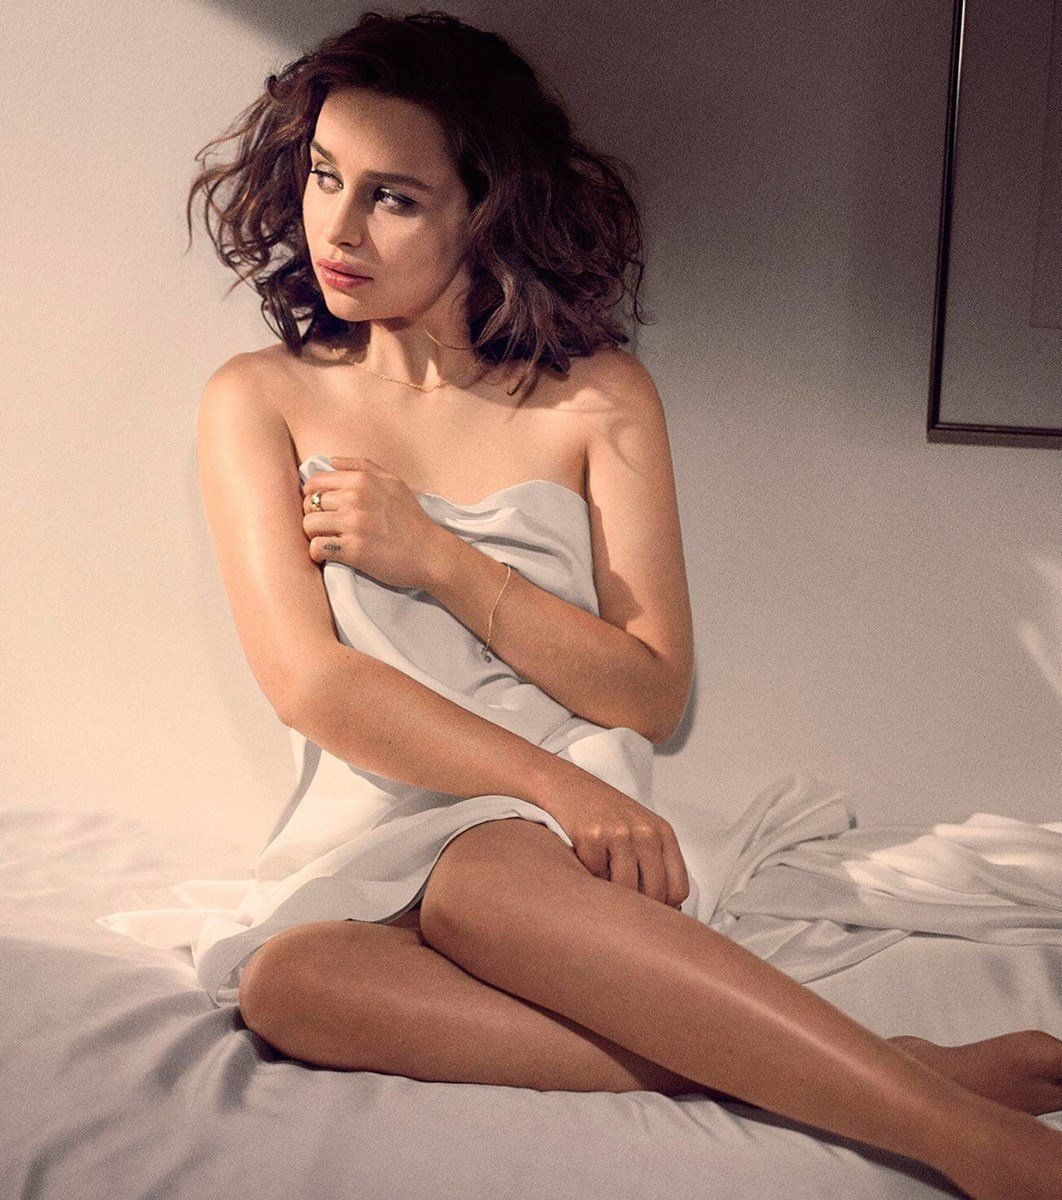 Emilia Clarke Covered Nudes Colorized